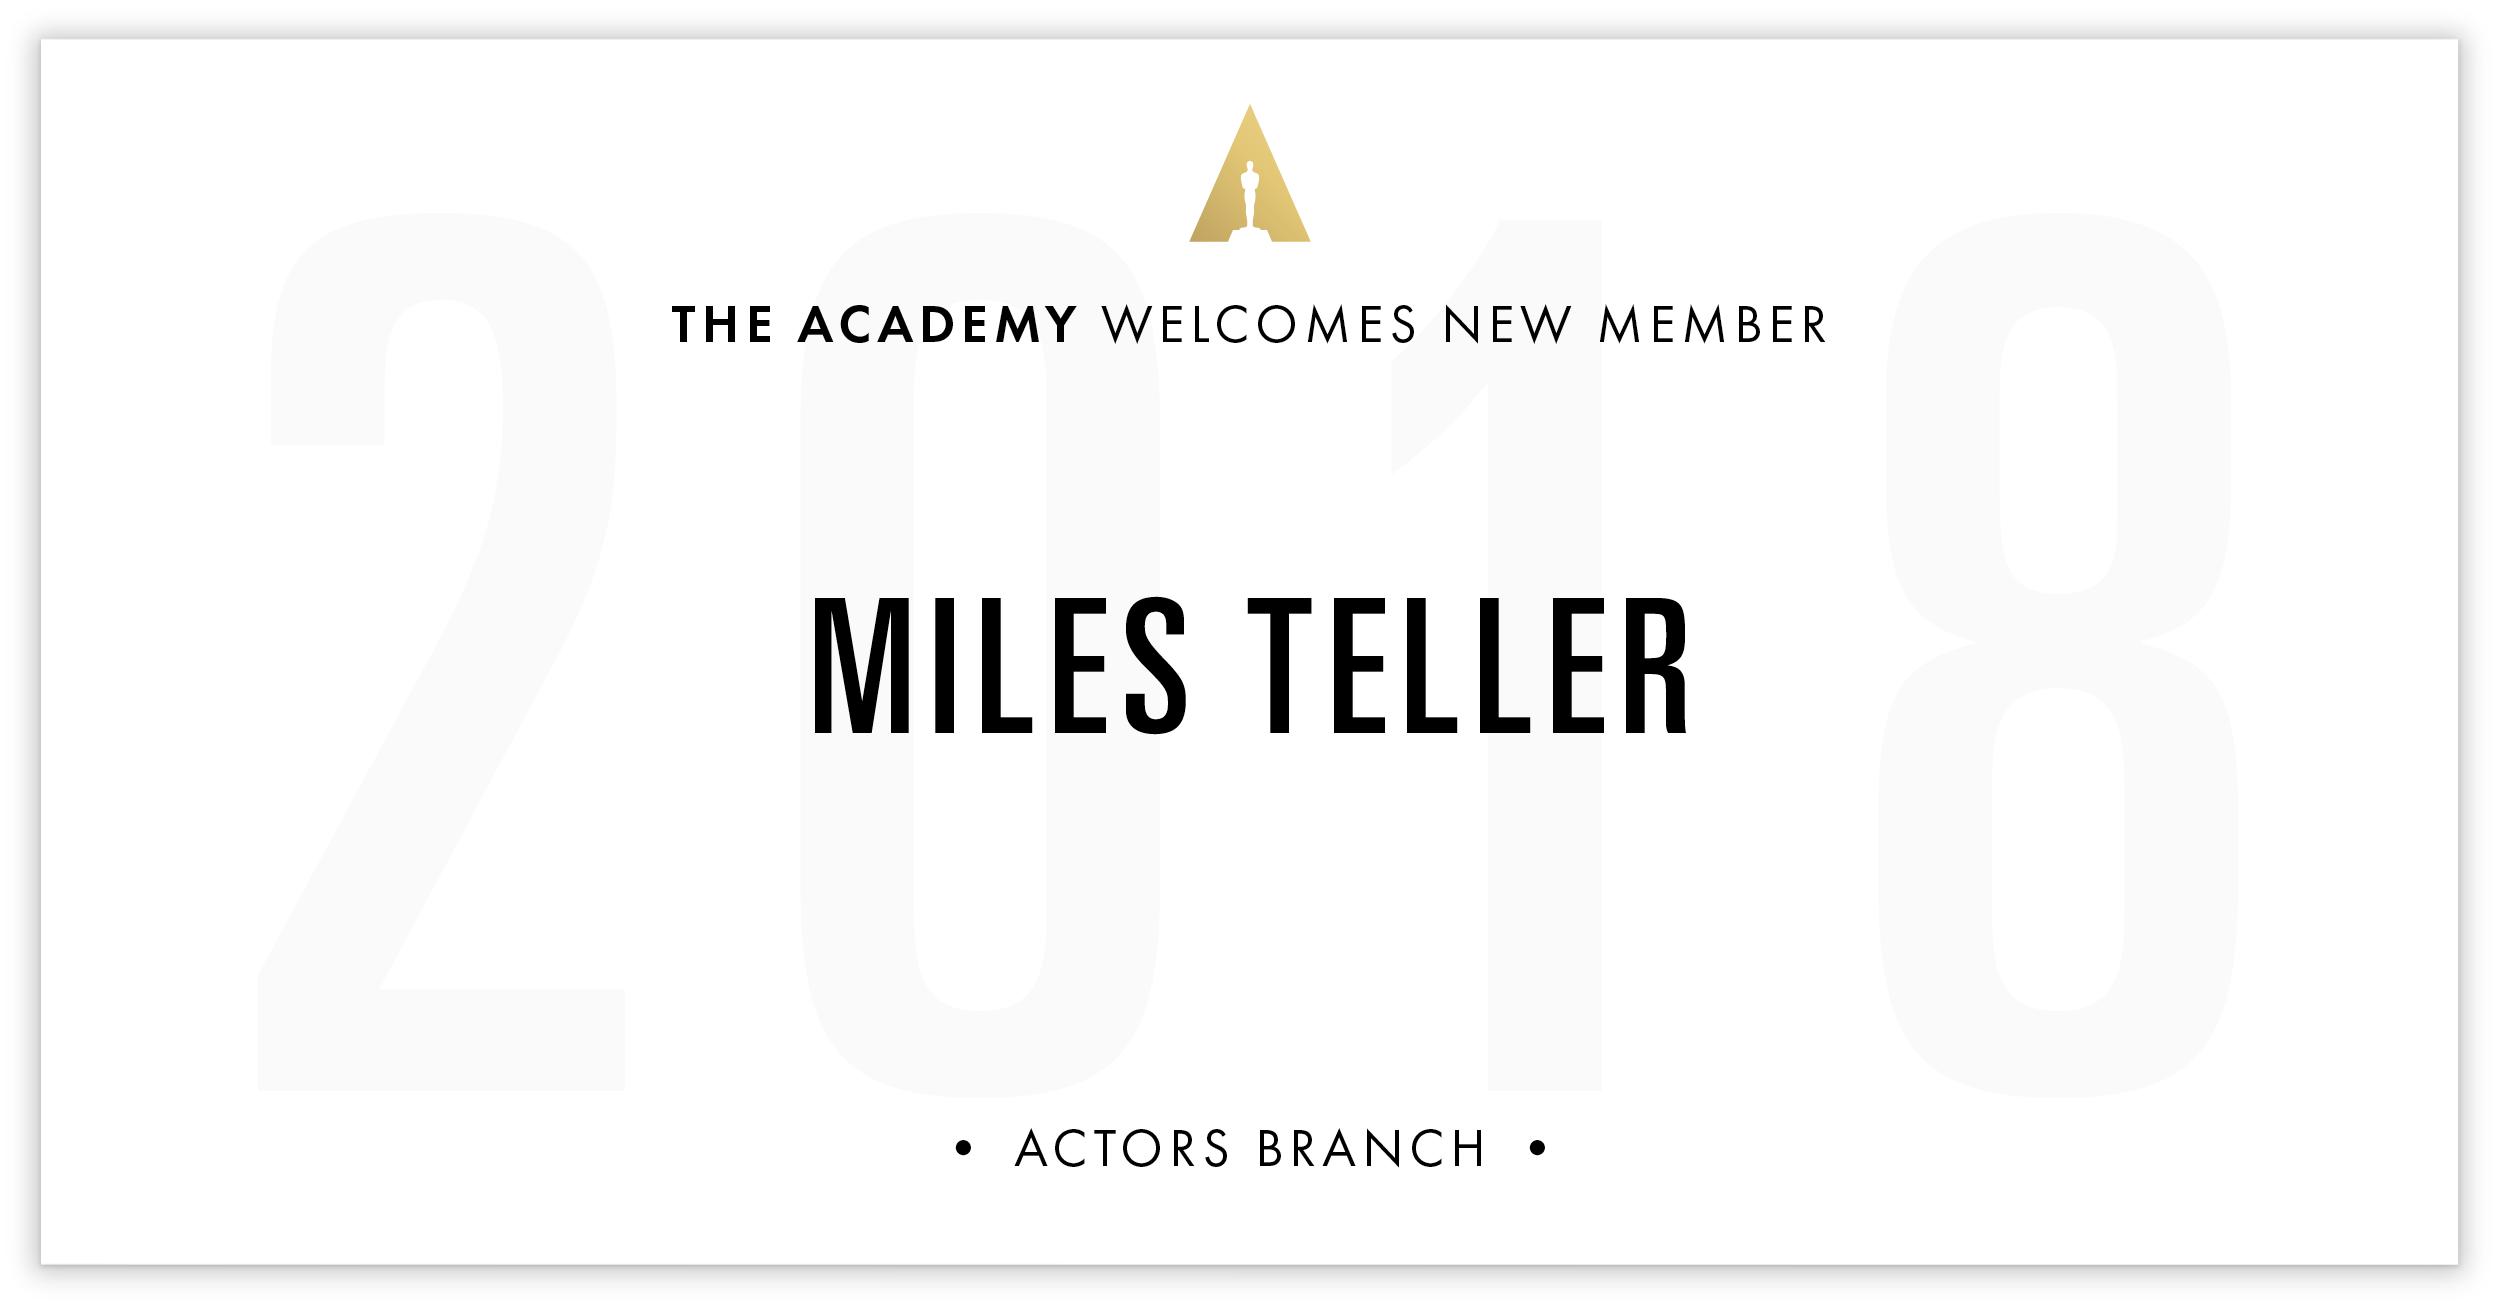 Miles Teller is invited!